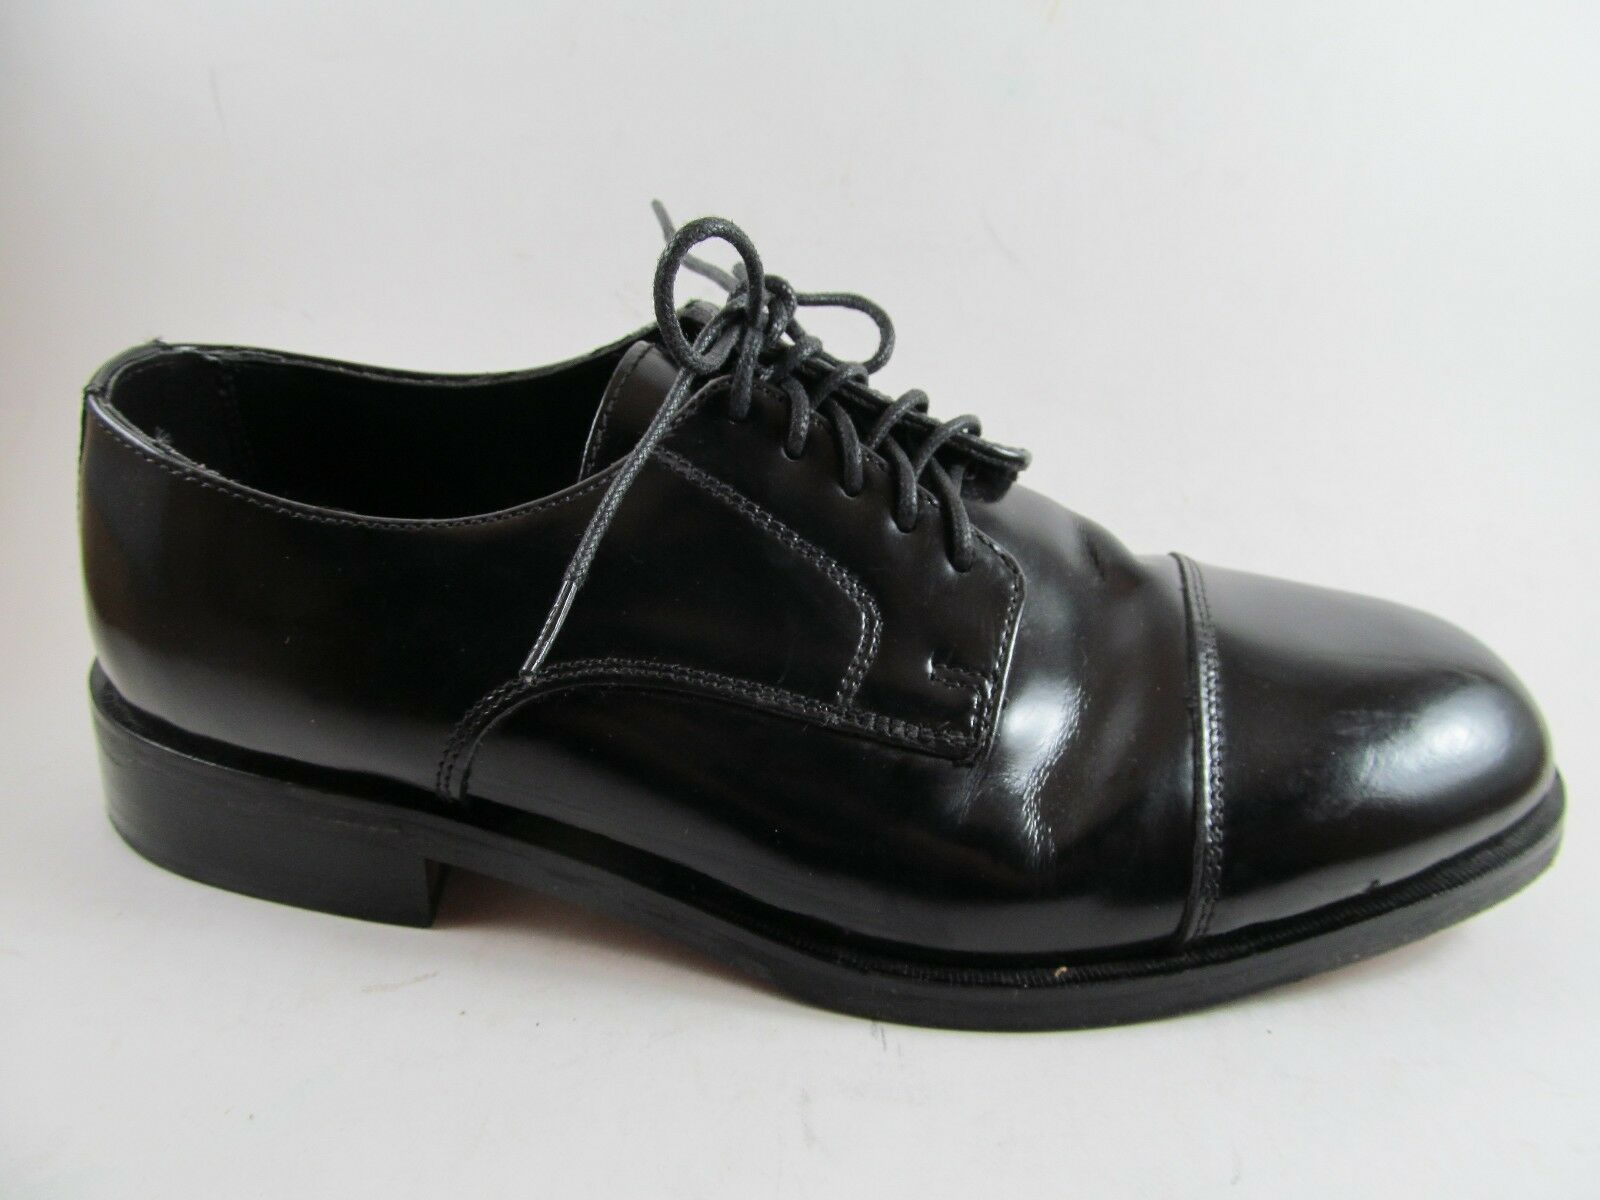 Nunn Bush Dress Flex 8 M Black 83522 Maddox Leather Oxford Cap Toe Laces